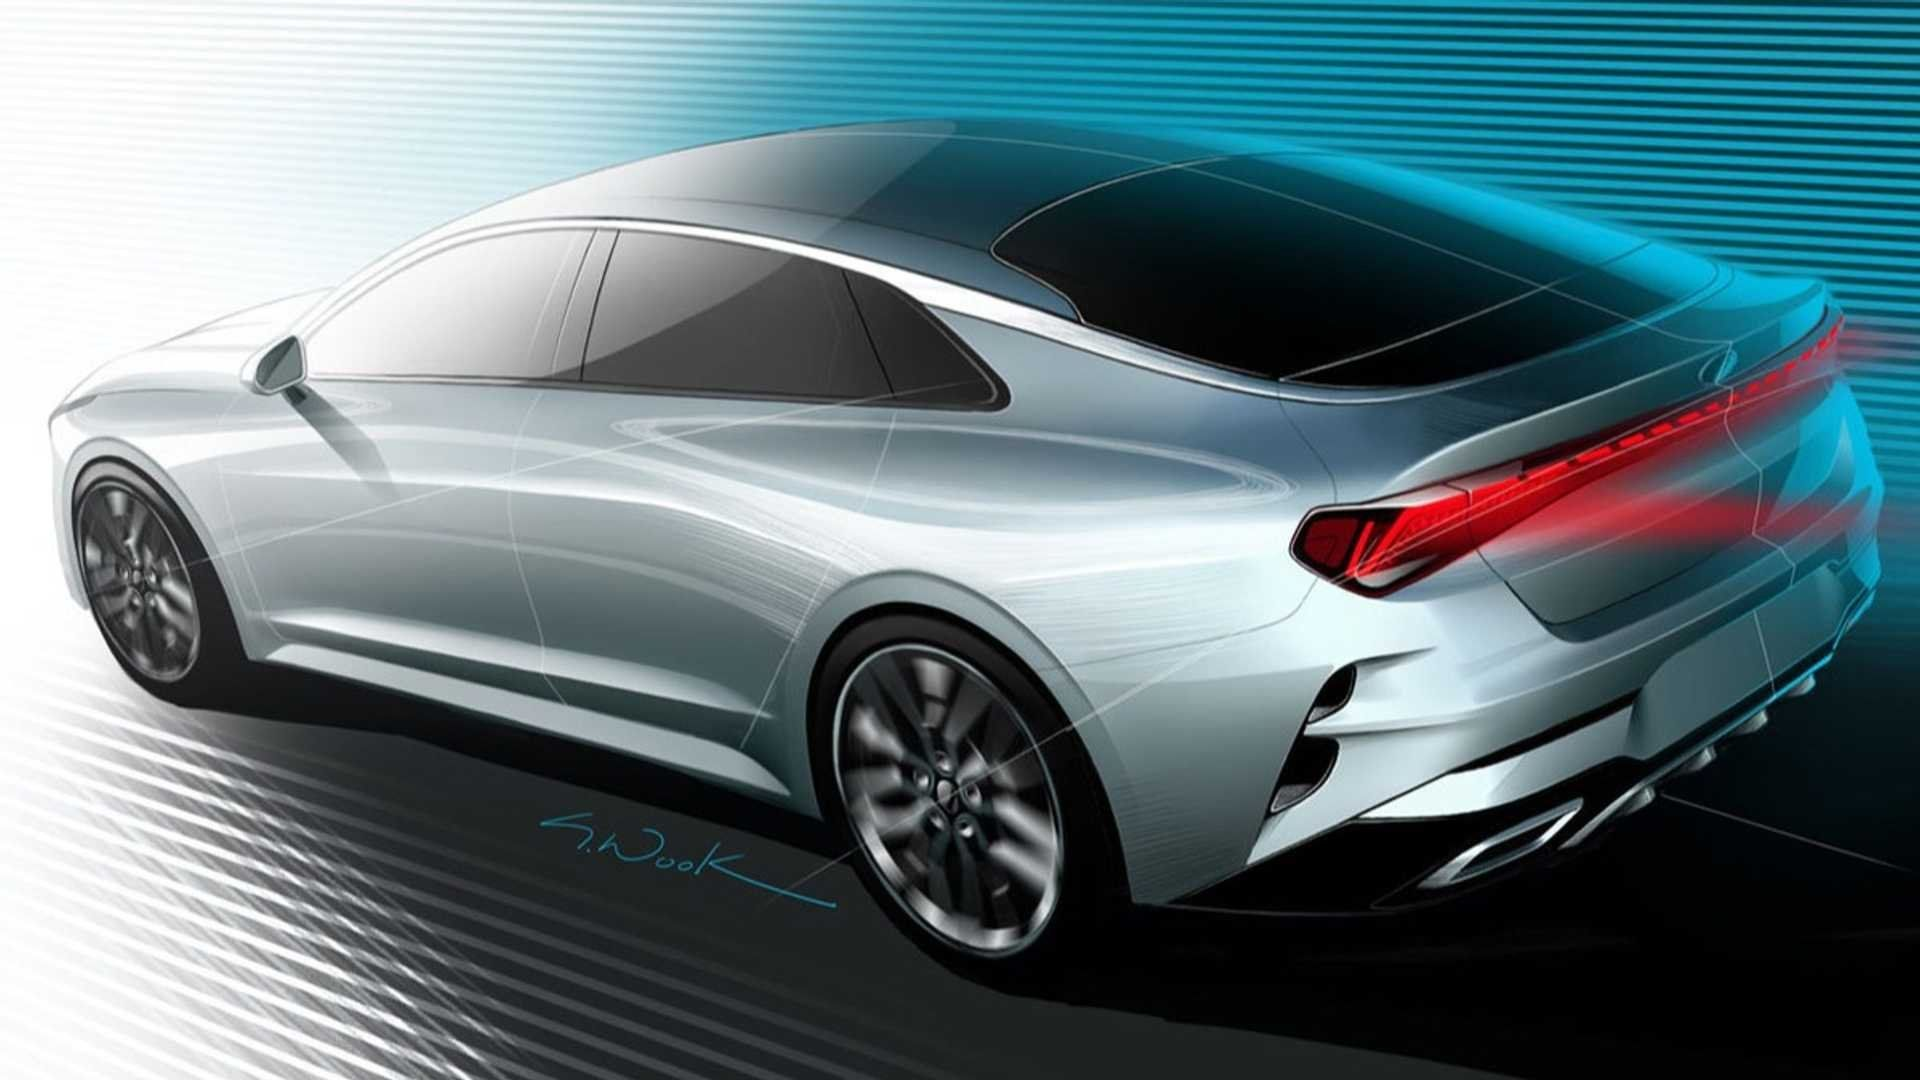 2021 Mazda 2 Model Kia Optima Kia Pontiac Gto